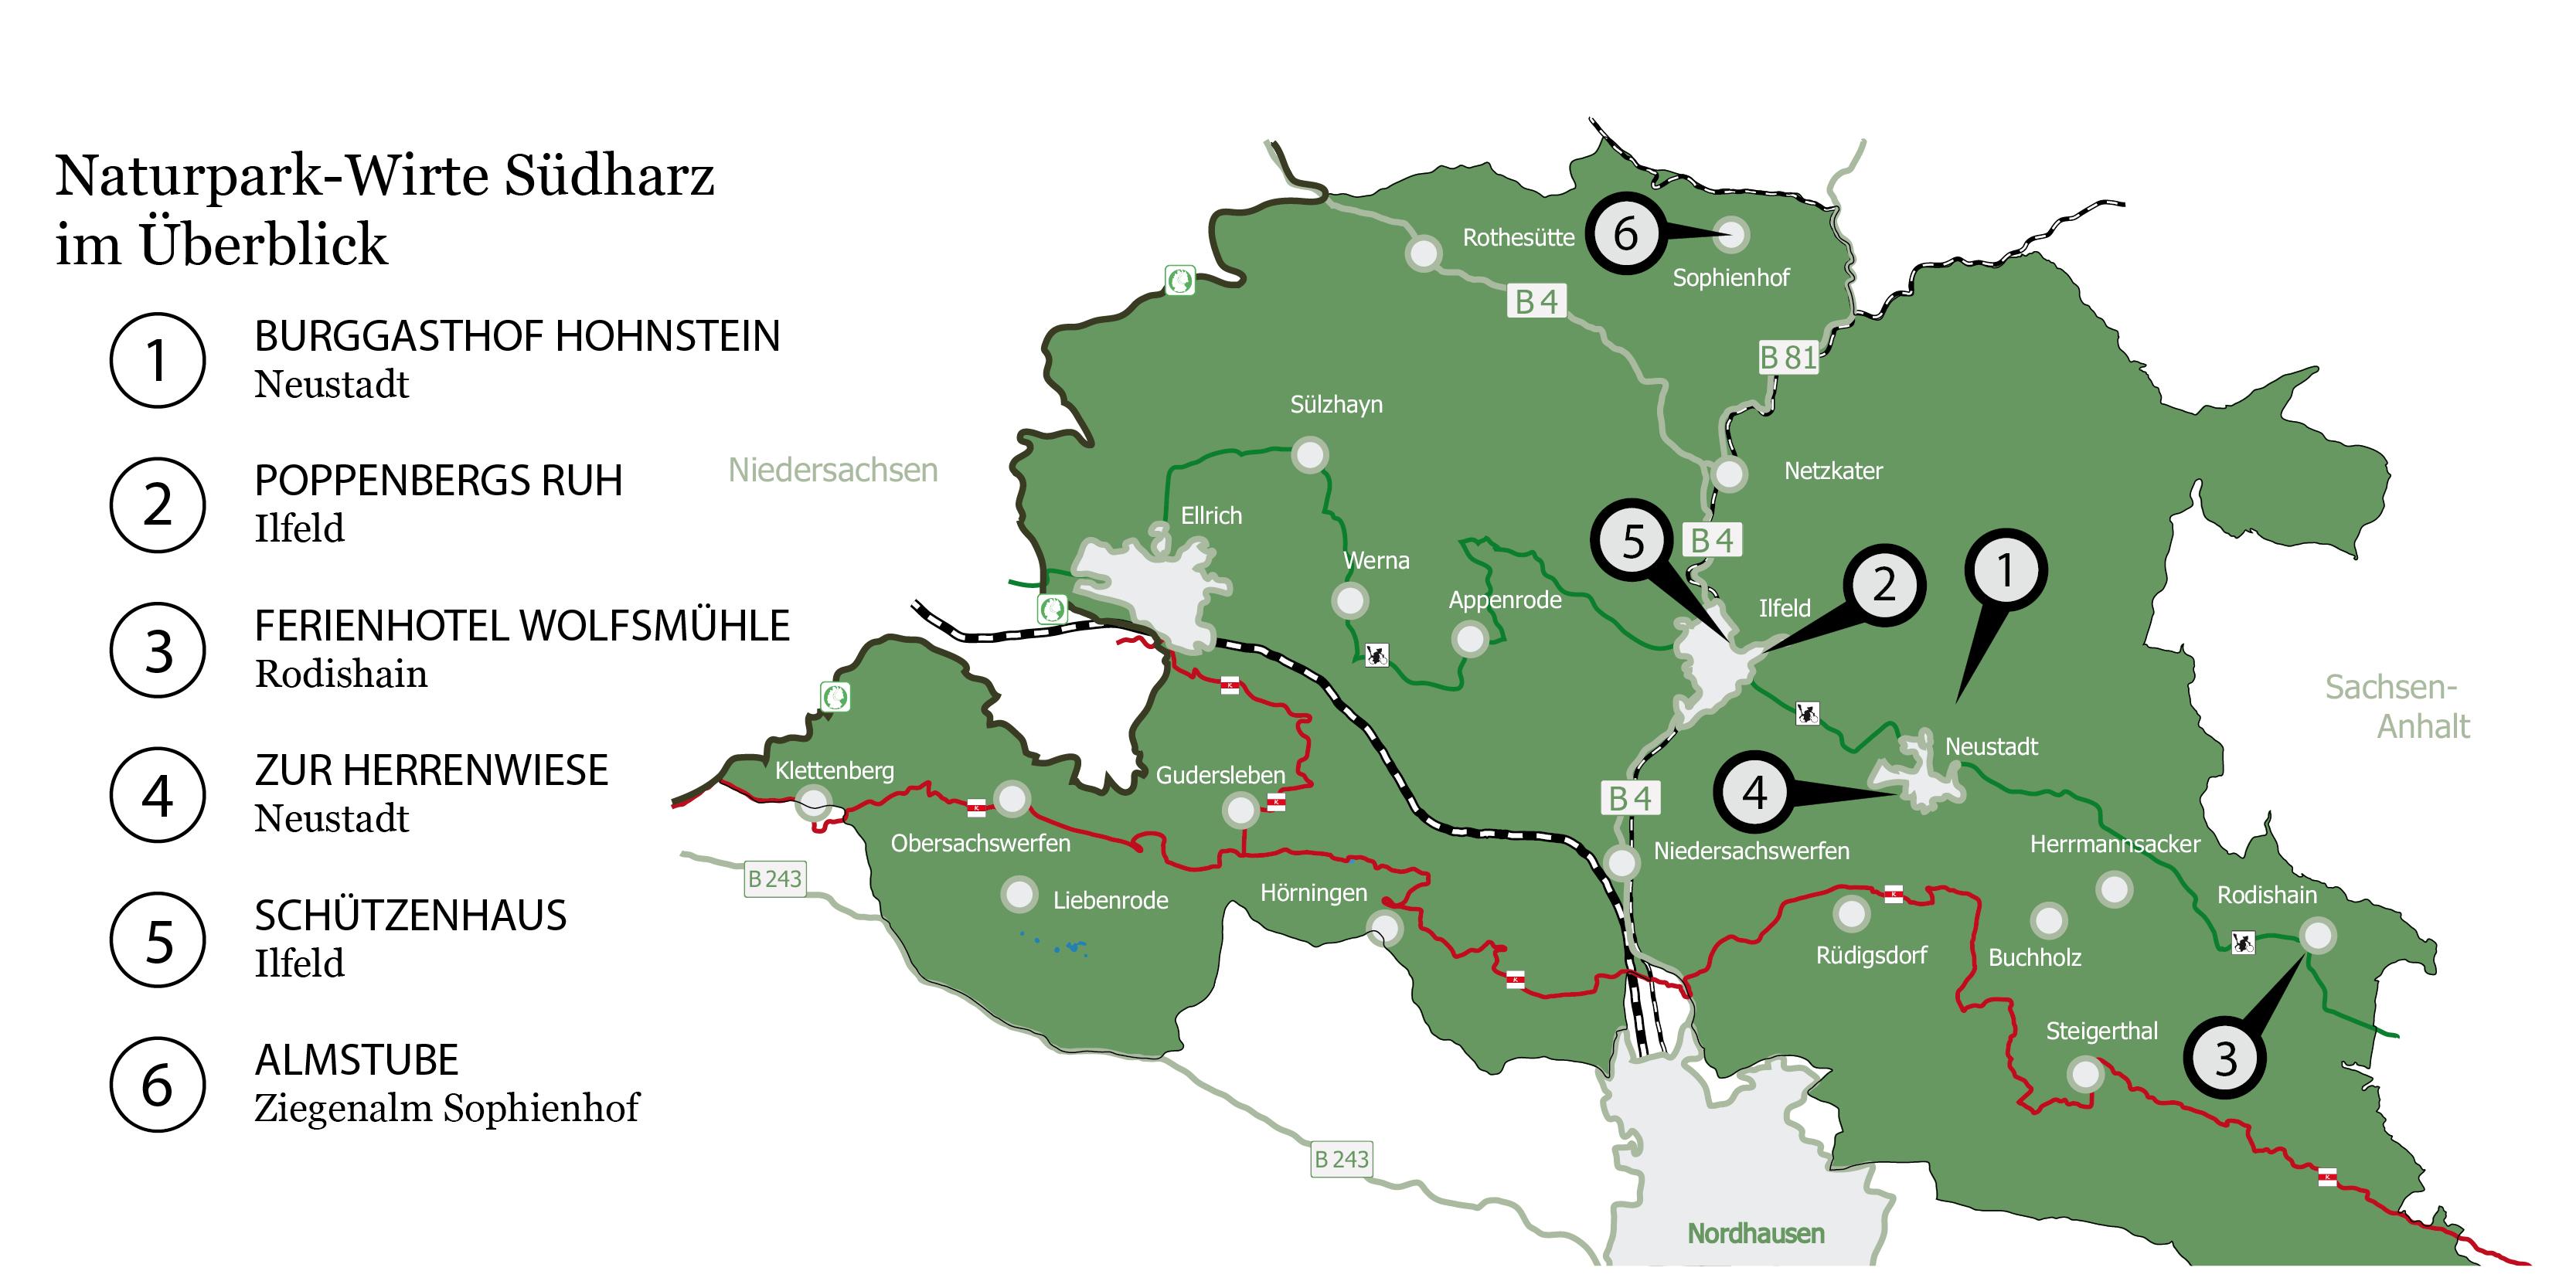 Naturpark Menüs Wirte